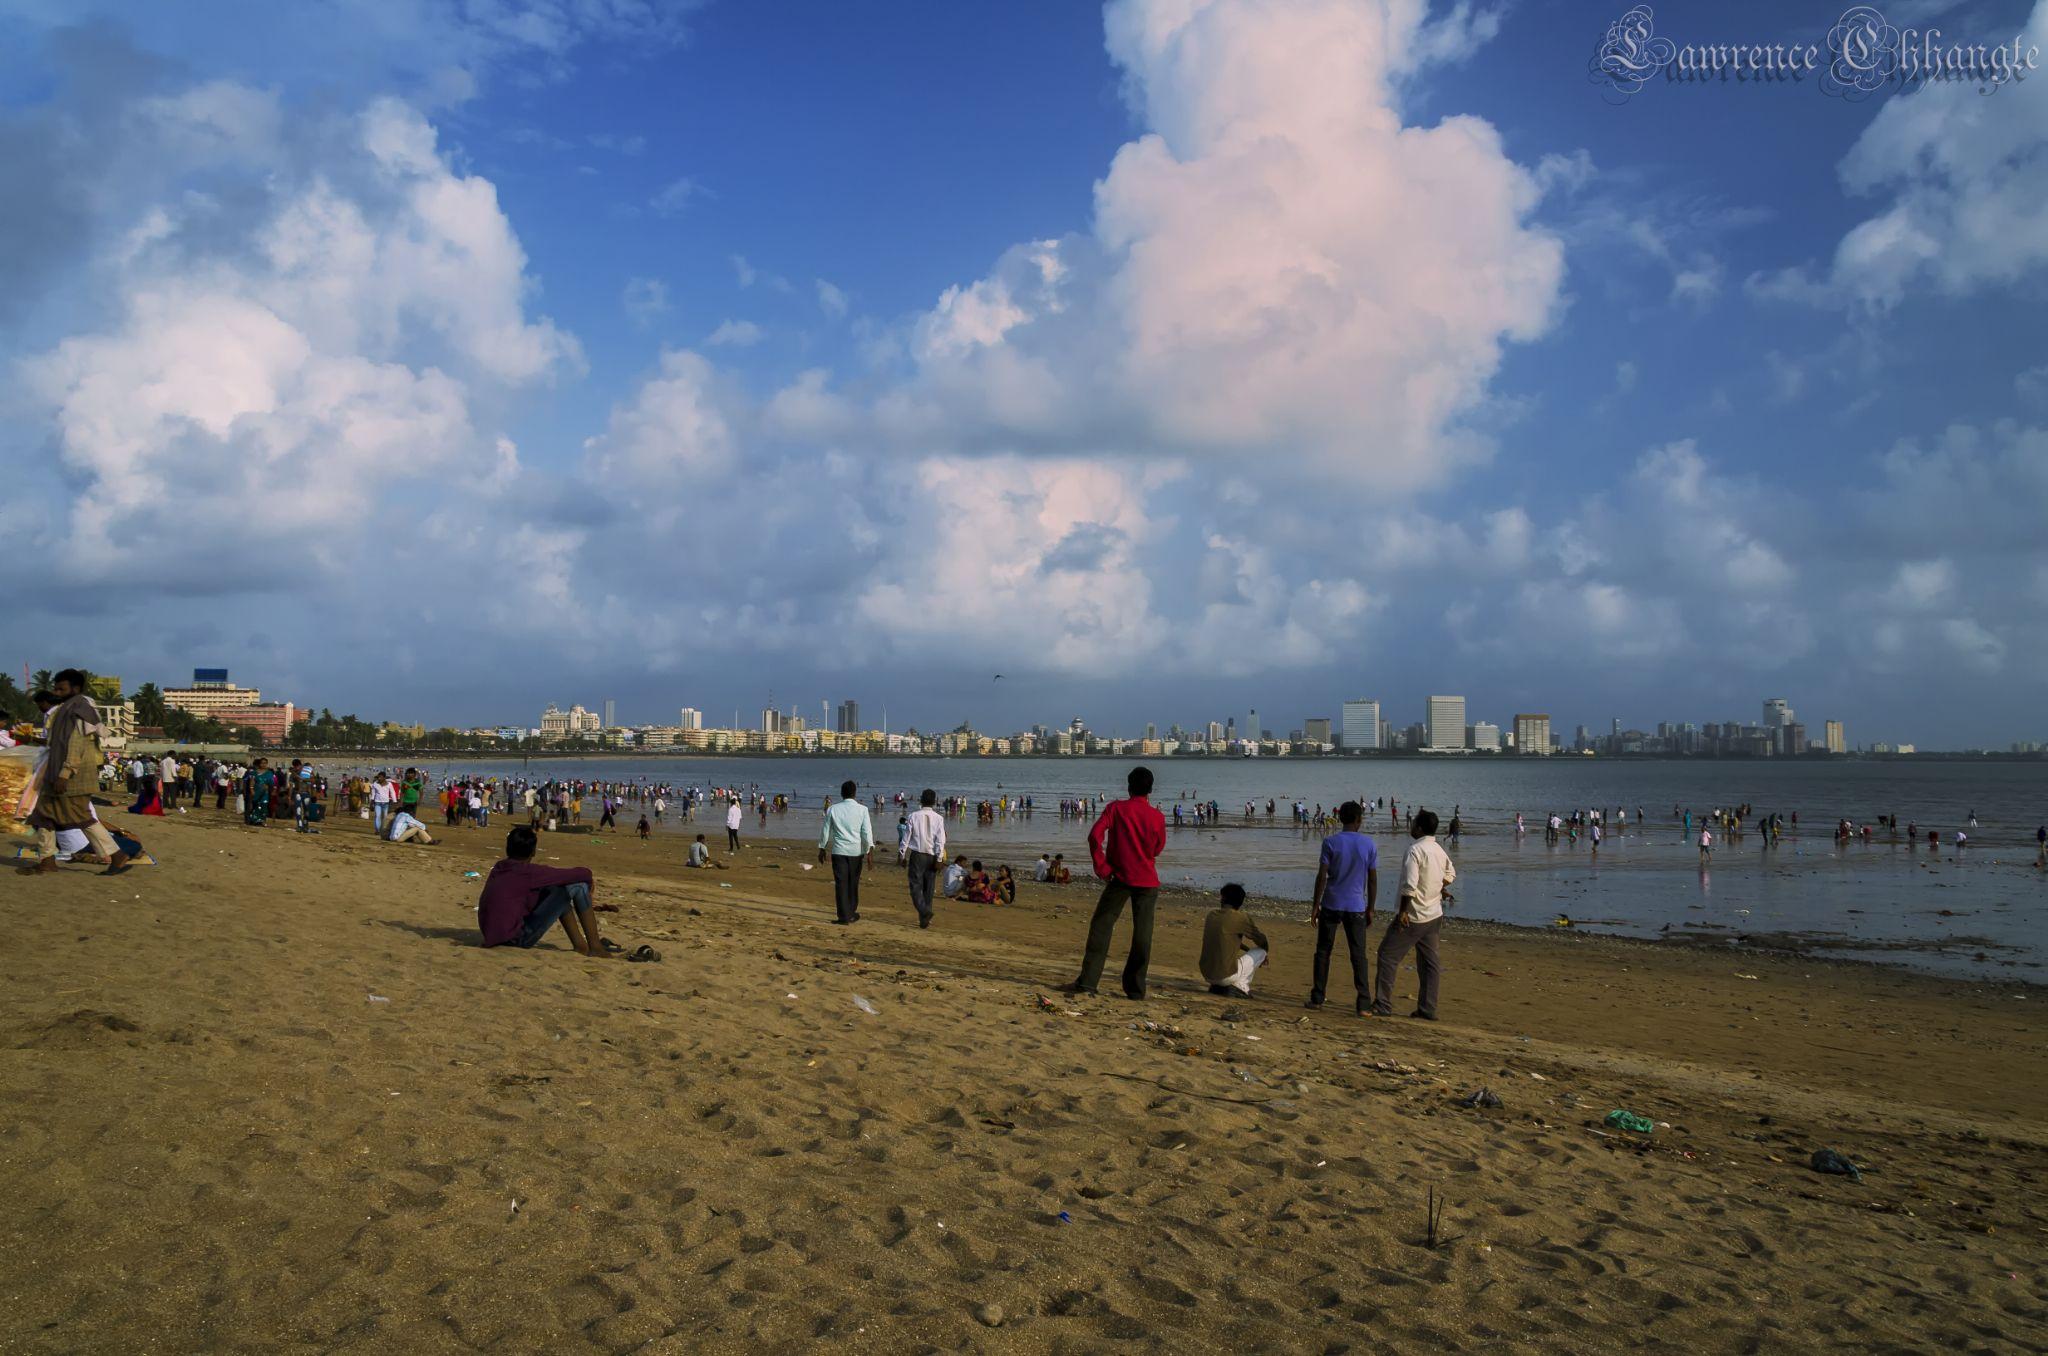 Mumbai by LawrenceChhangte